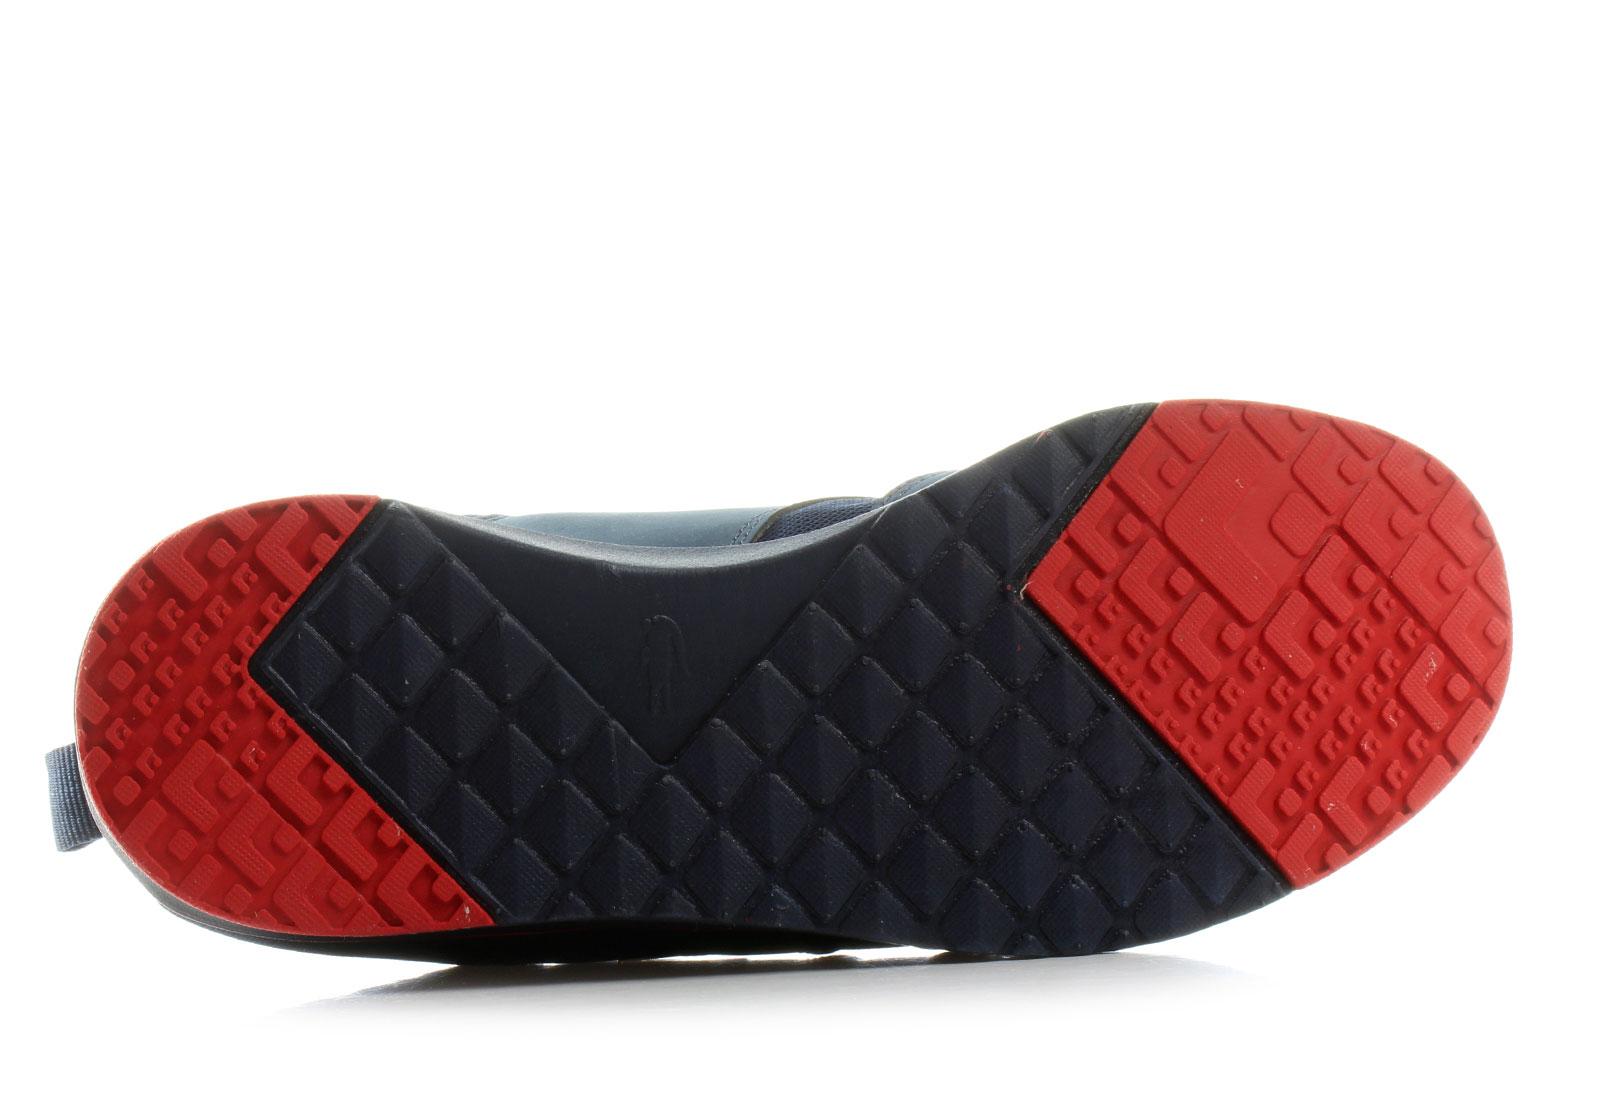 Lacoste Cipő - L.ight - 161spm0024-003 - Office Shoes Magyarország 538c6f4ae9